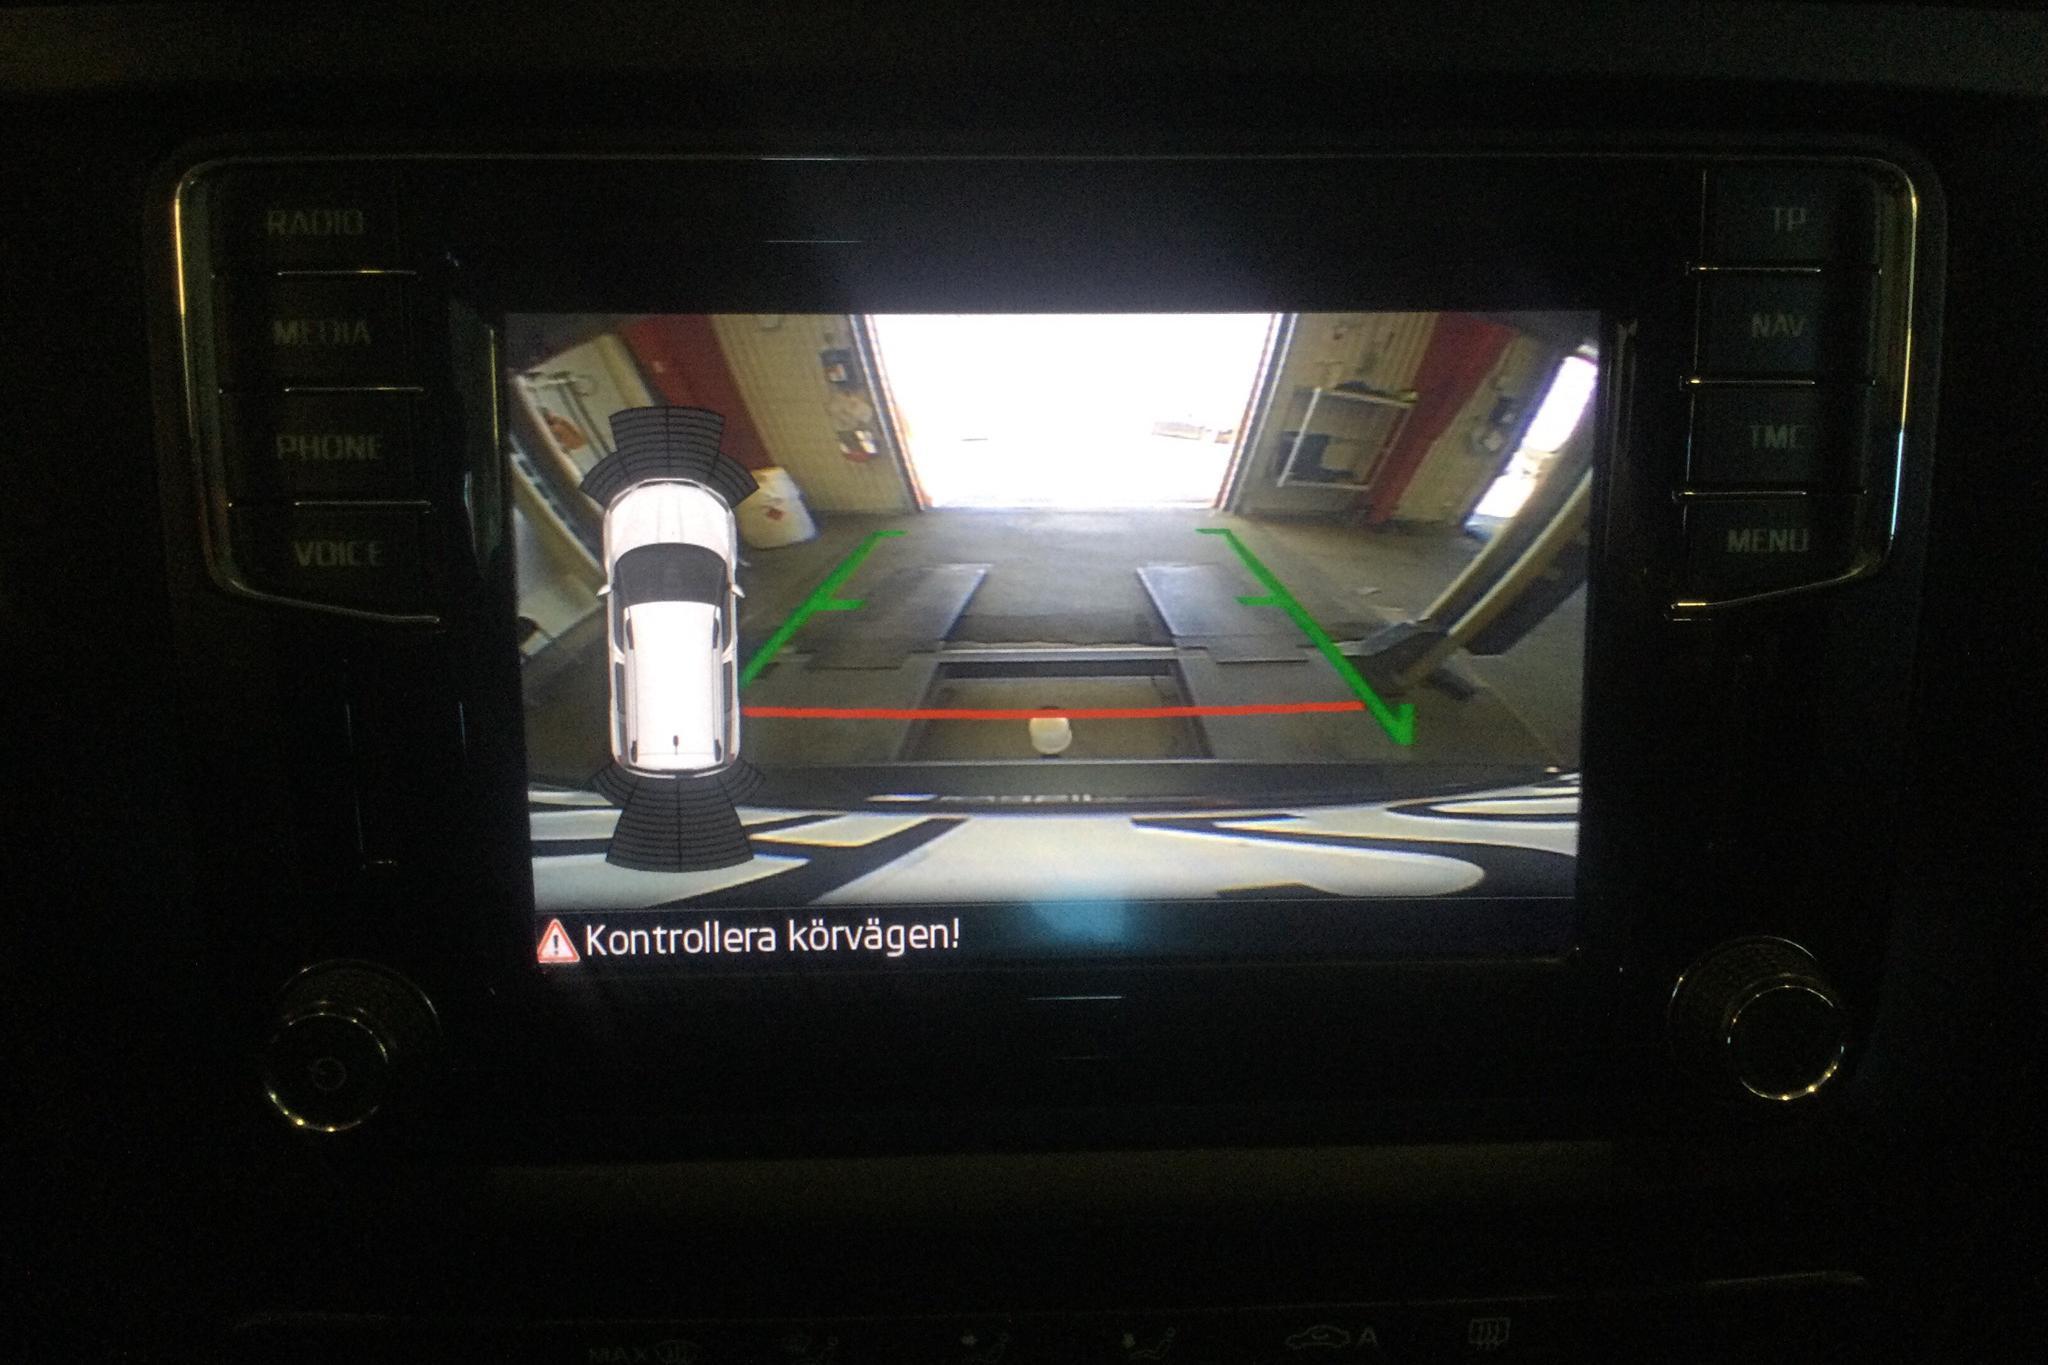 Skoda Yeti 2.0 TDI 4X4 (150hk) - 14 269 mil - Automat - grå - 2016